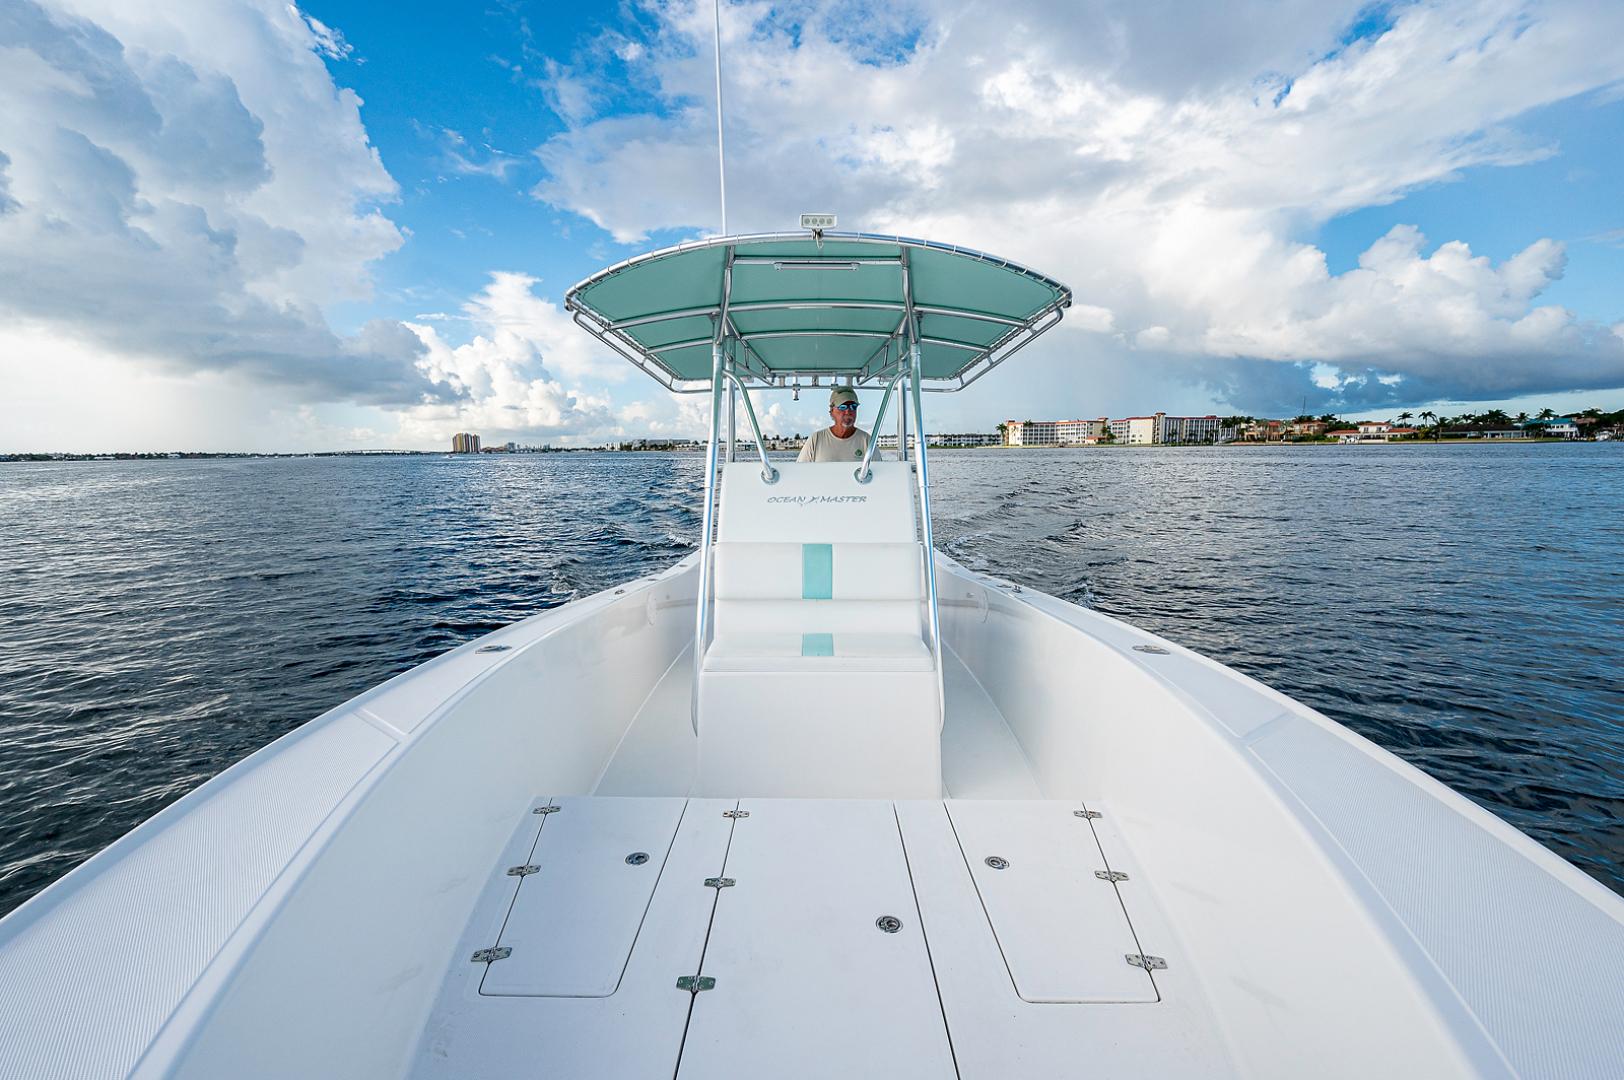 Ocean Master 2013-27 Ocean Master Palm Beach-Florida-United States-Foredeck-1501364 | Thumbnail